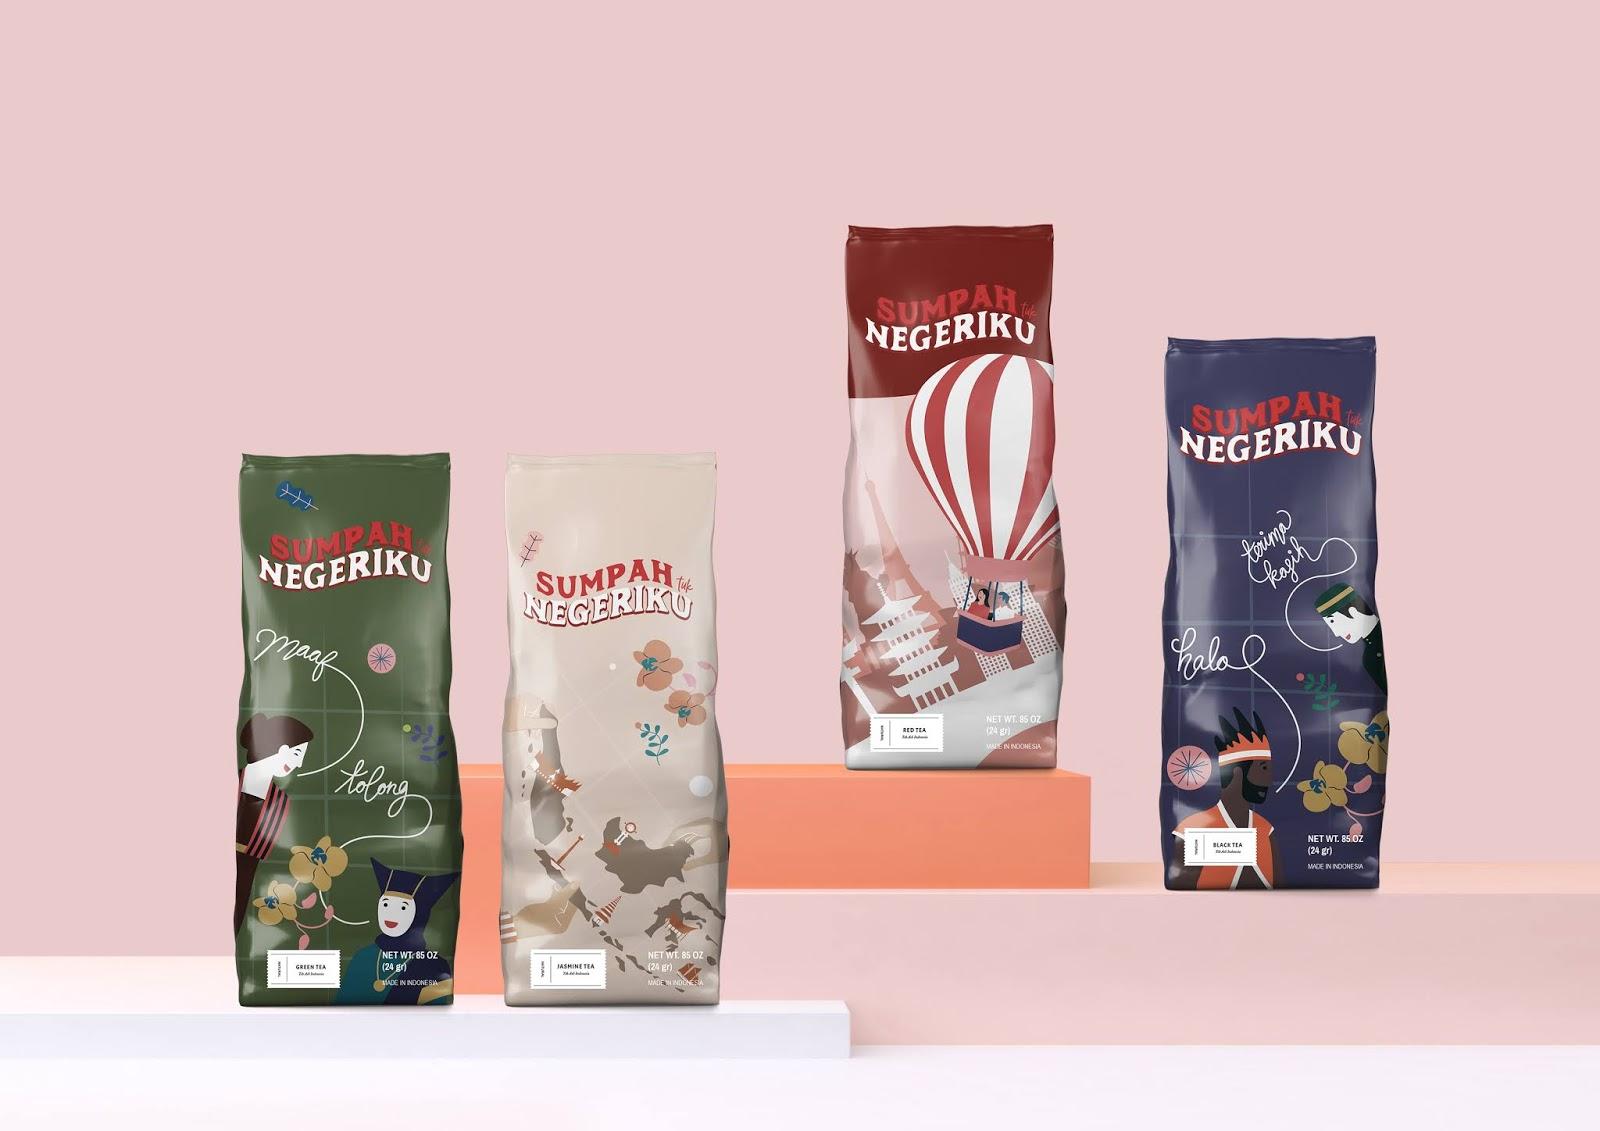 Sumpah Tuk Negeriku (The Youth Pledge) on Packaging of the